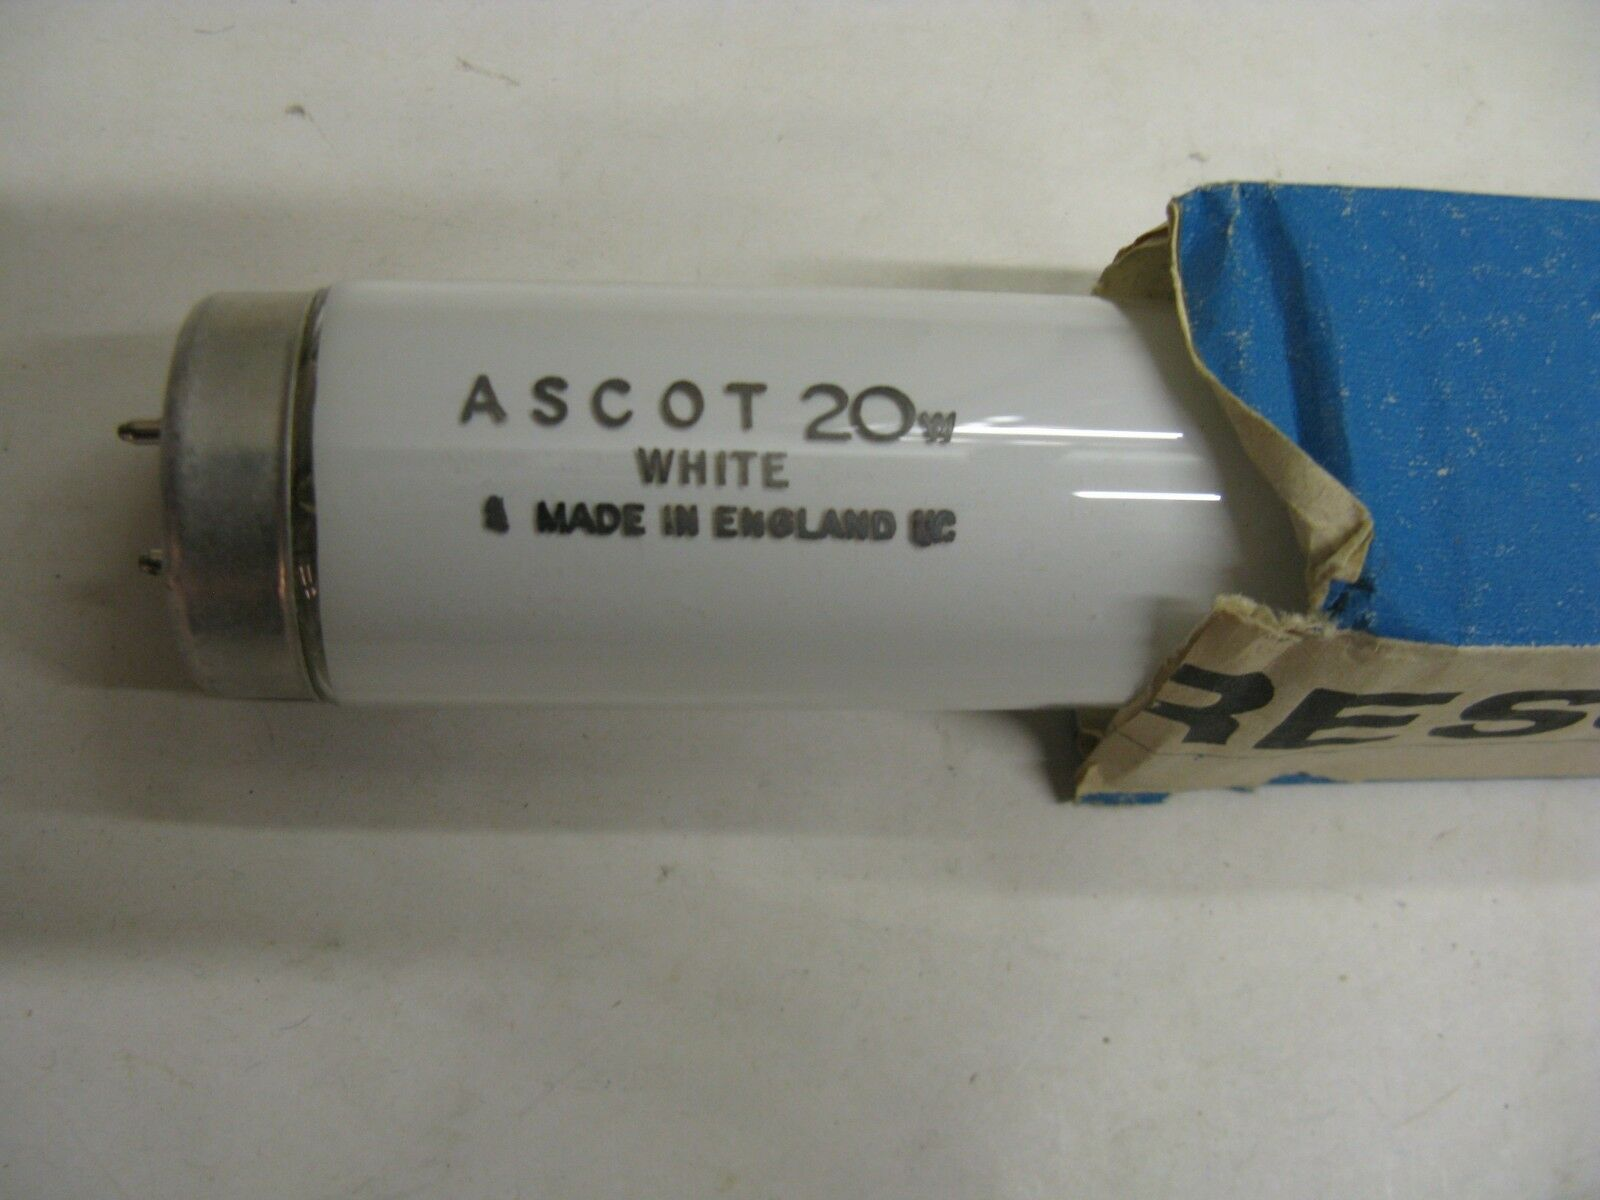 Caja de 14 X Ascot T12 20W 2ft Tubos Fluorescentes lámparas de bulbo blancooo Trabajo Lote Made